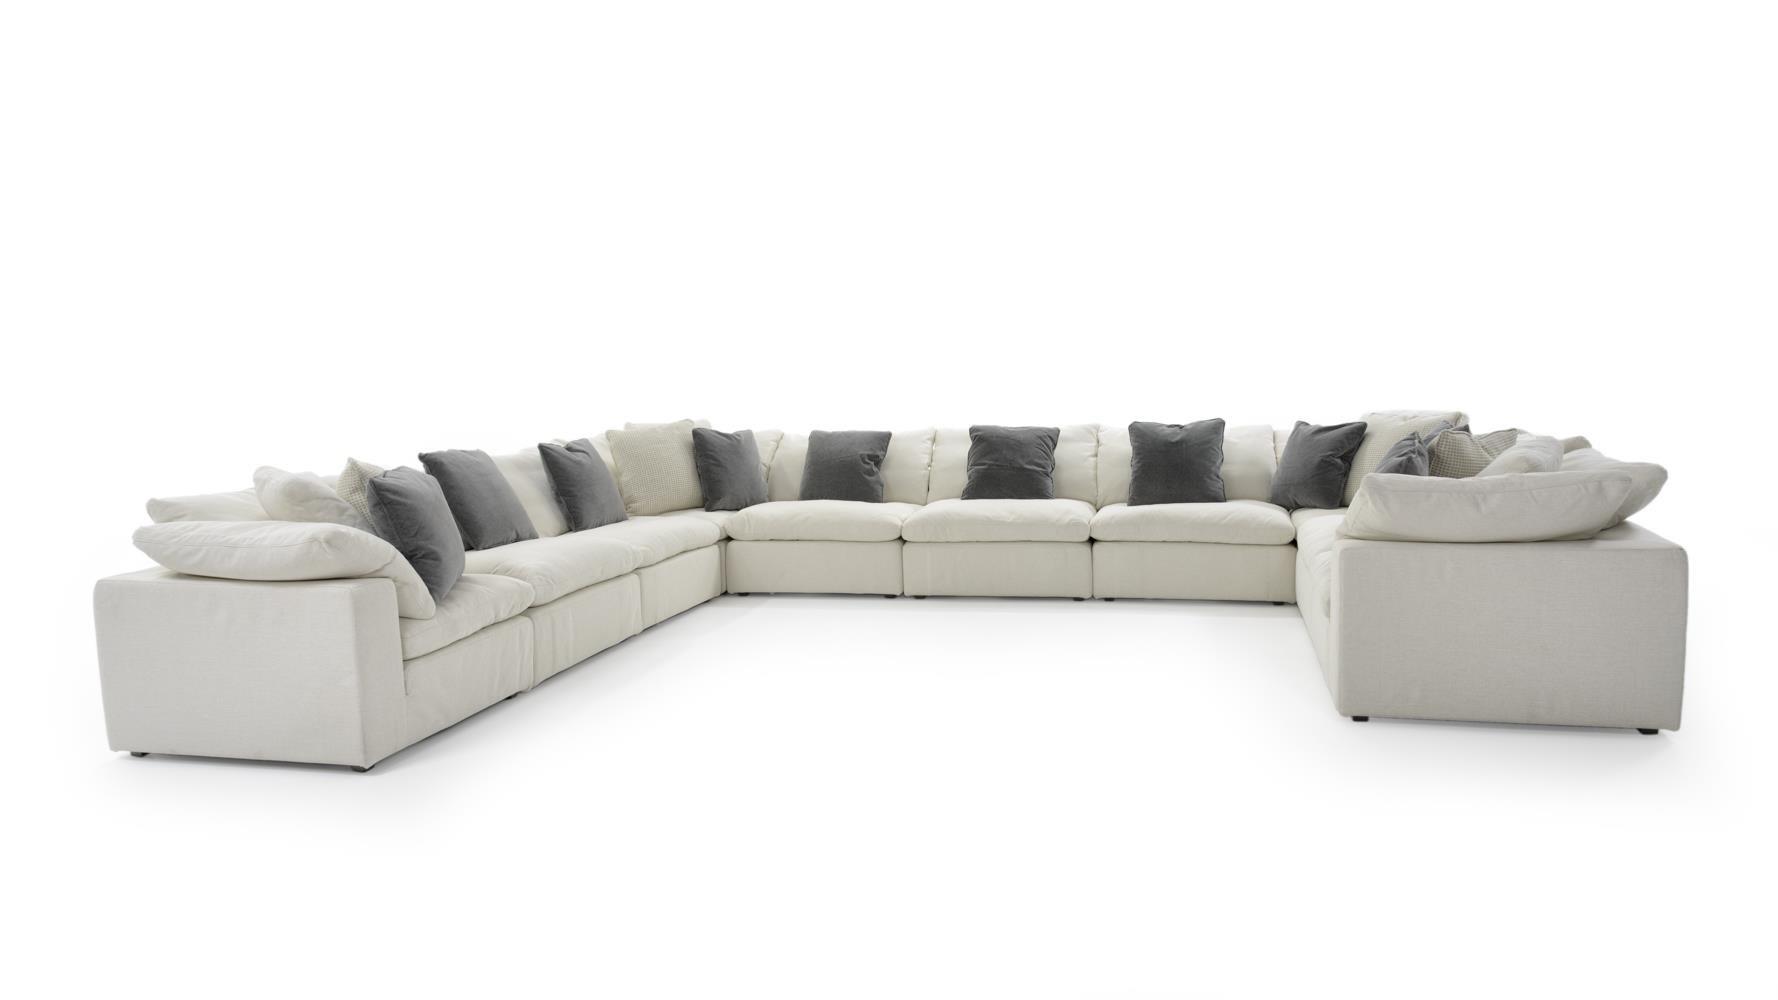 ten piece sectional sofa group